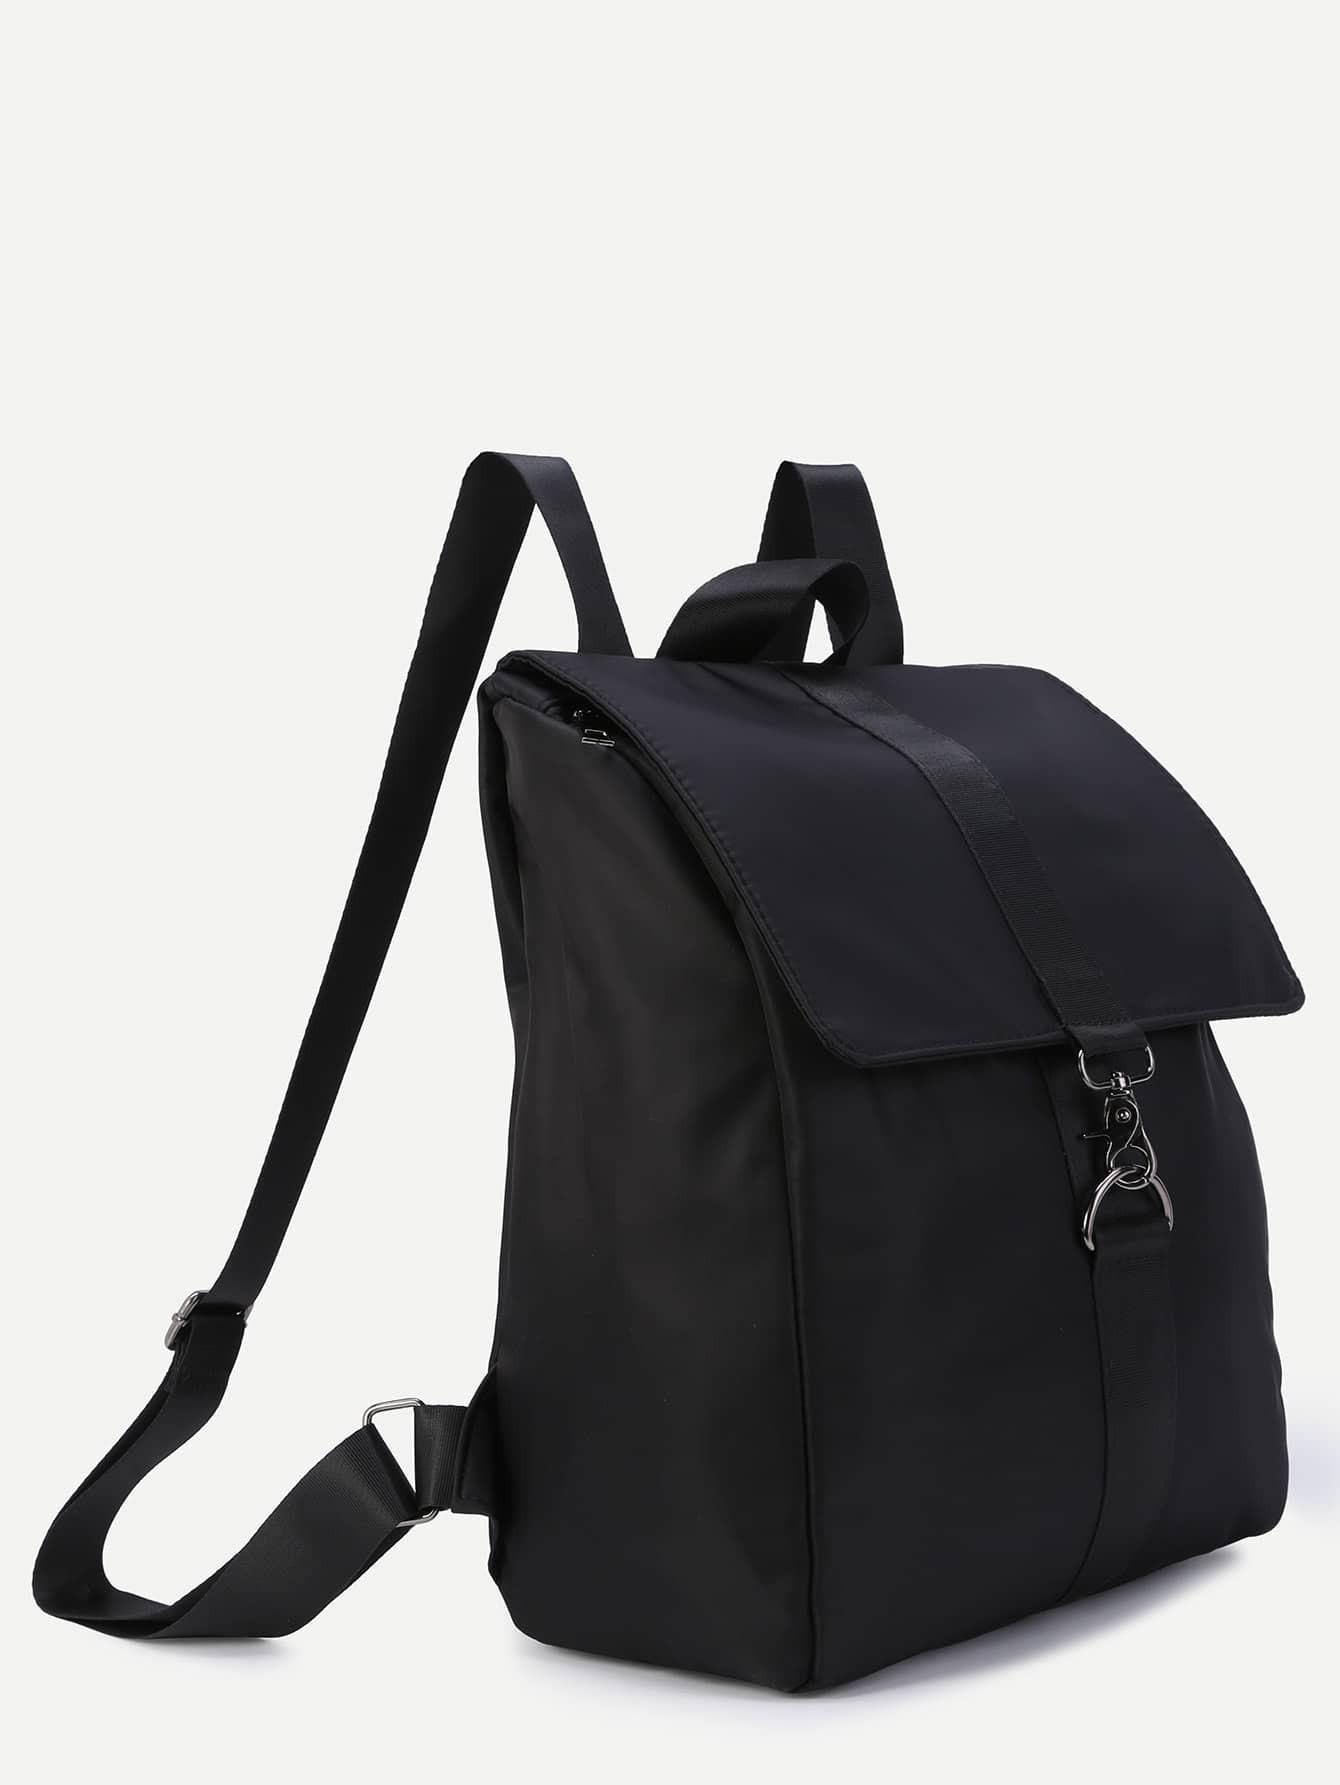 bag161011916_2